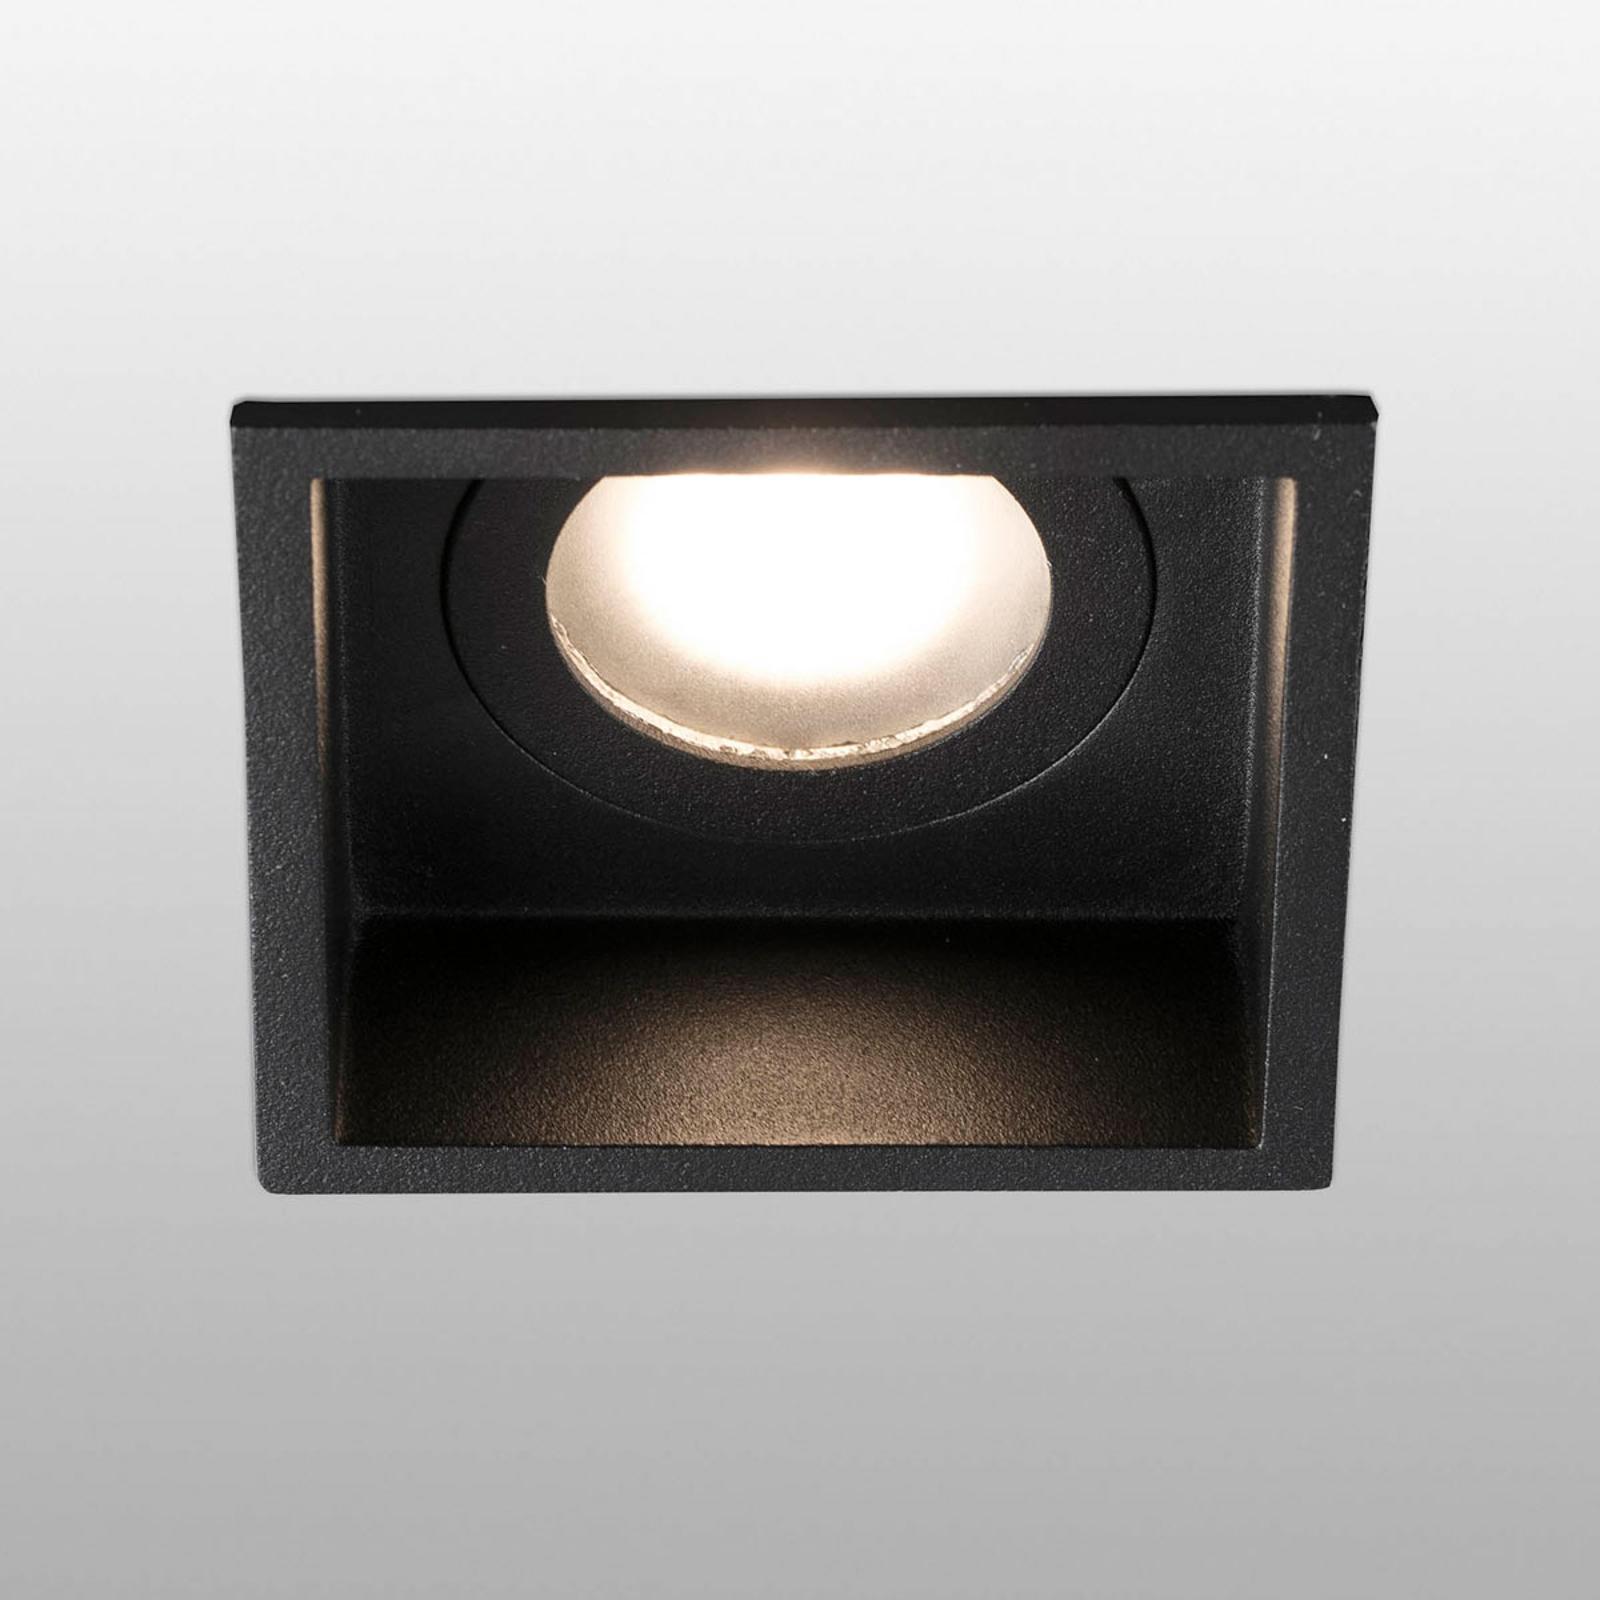 Foco empotrado Hyde 1 luz marco angular IP44 negro